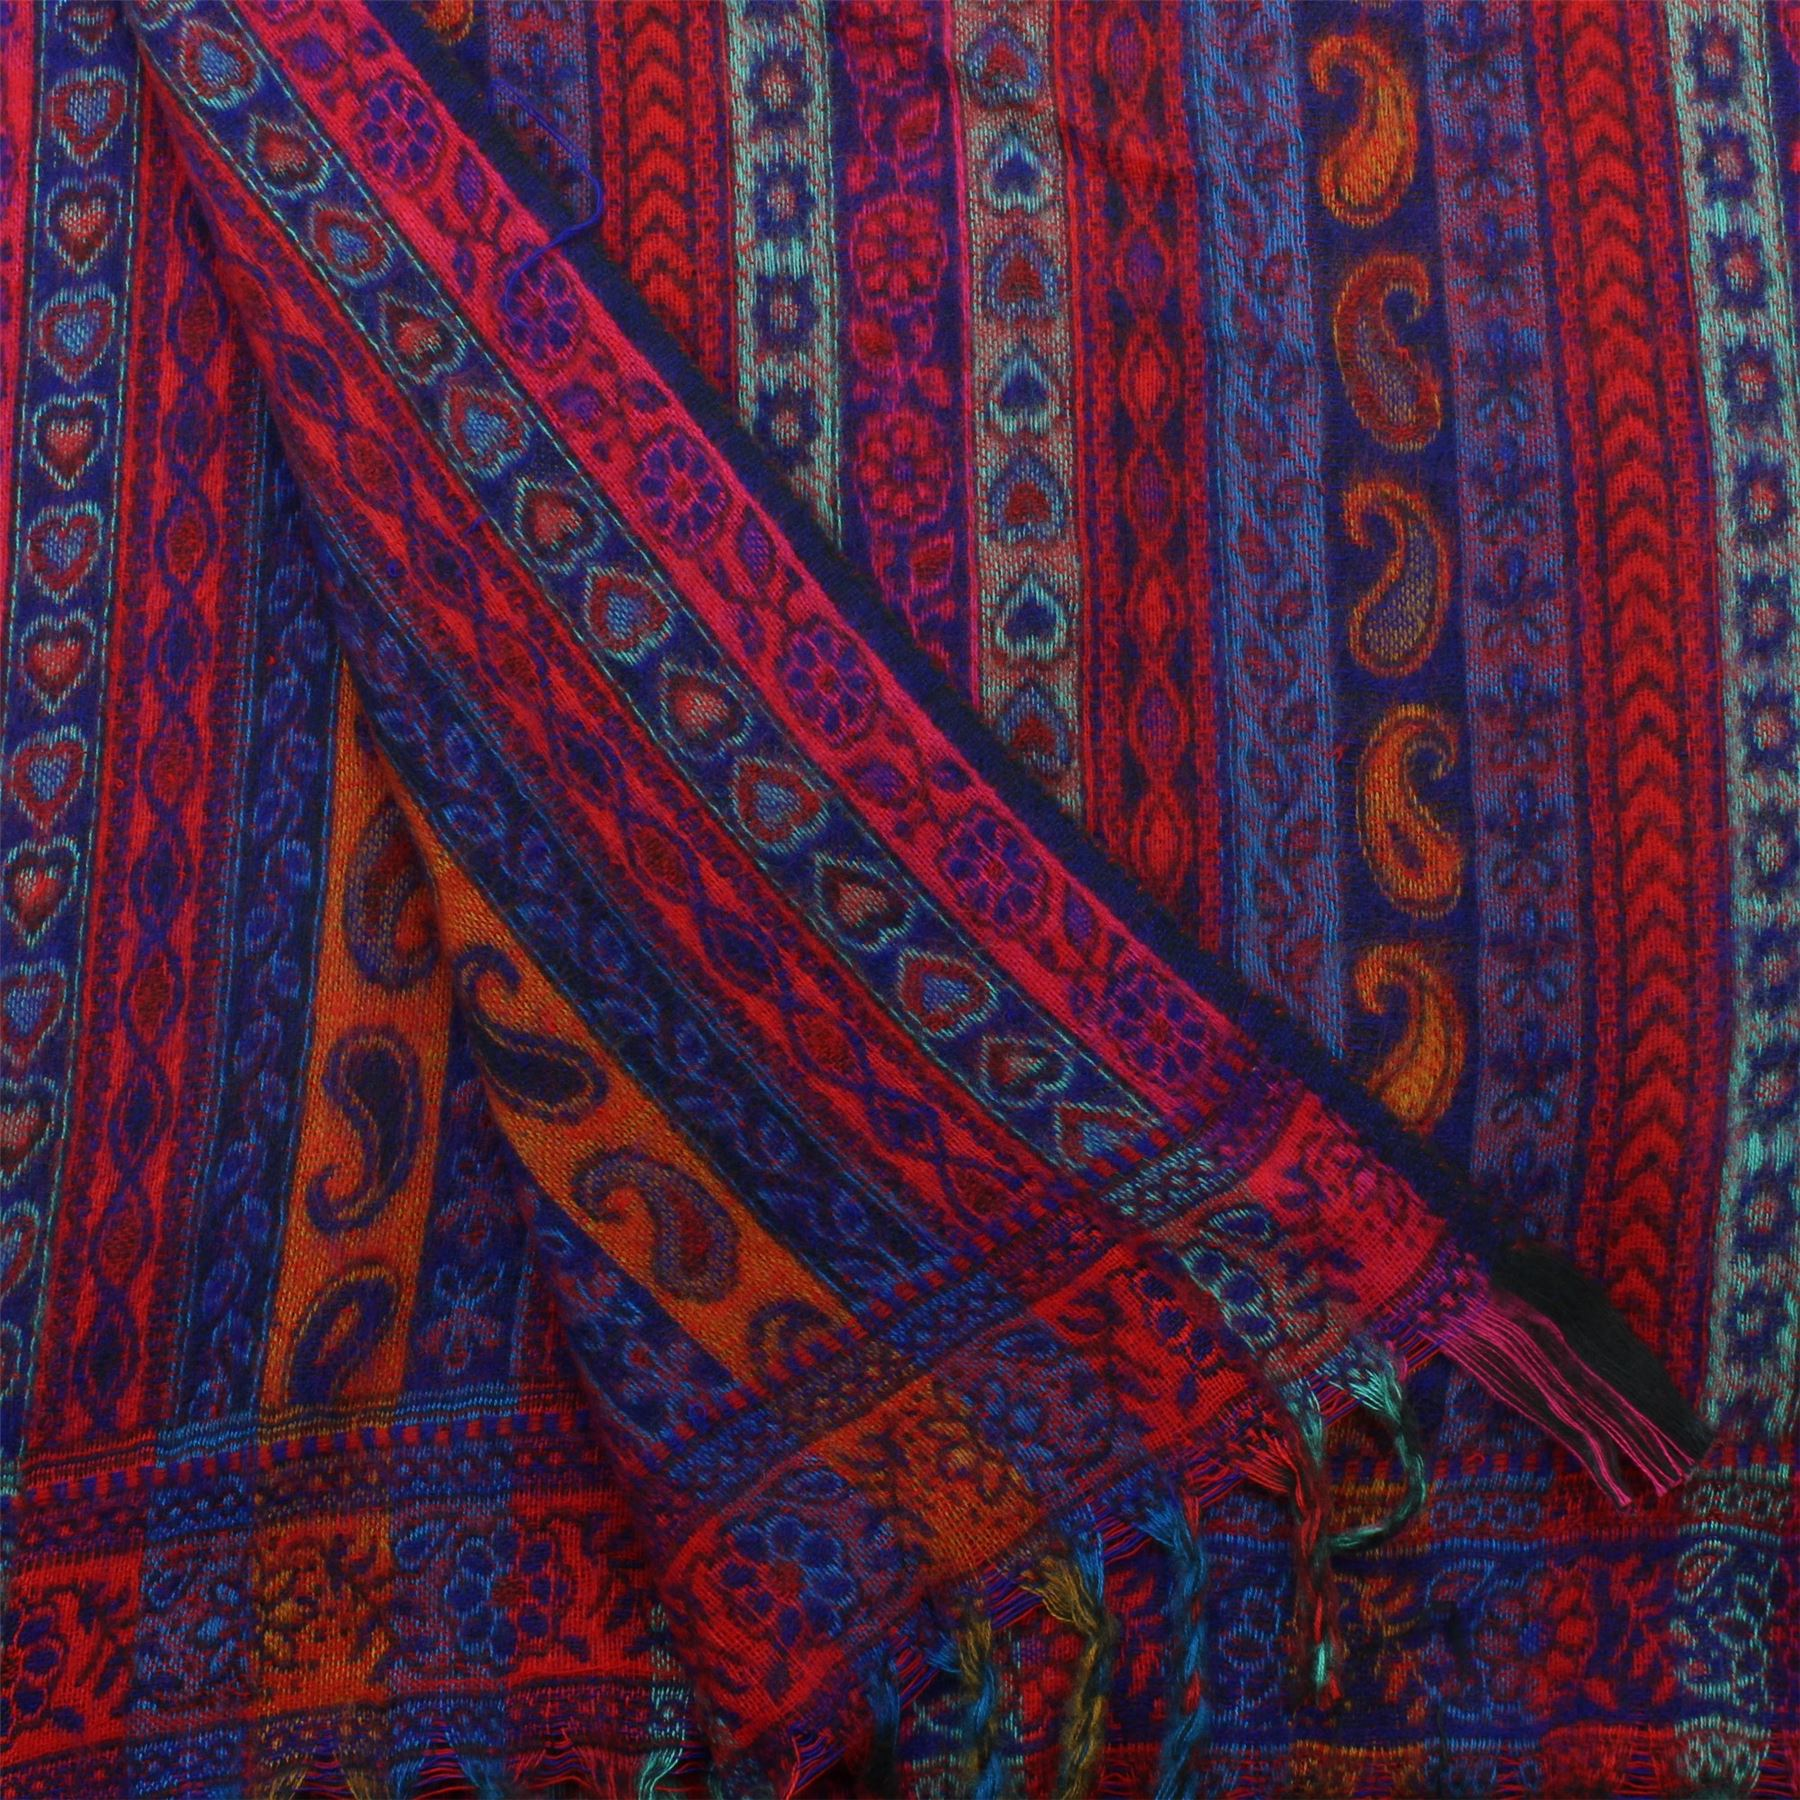 Acrylic-Wool-Blanket-Shawl-Wrap-Throw-Finest-Softest-India-Stripe-Paisley-Travel thumbnail 10